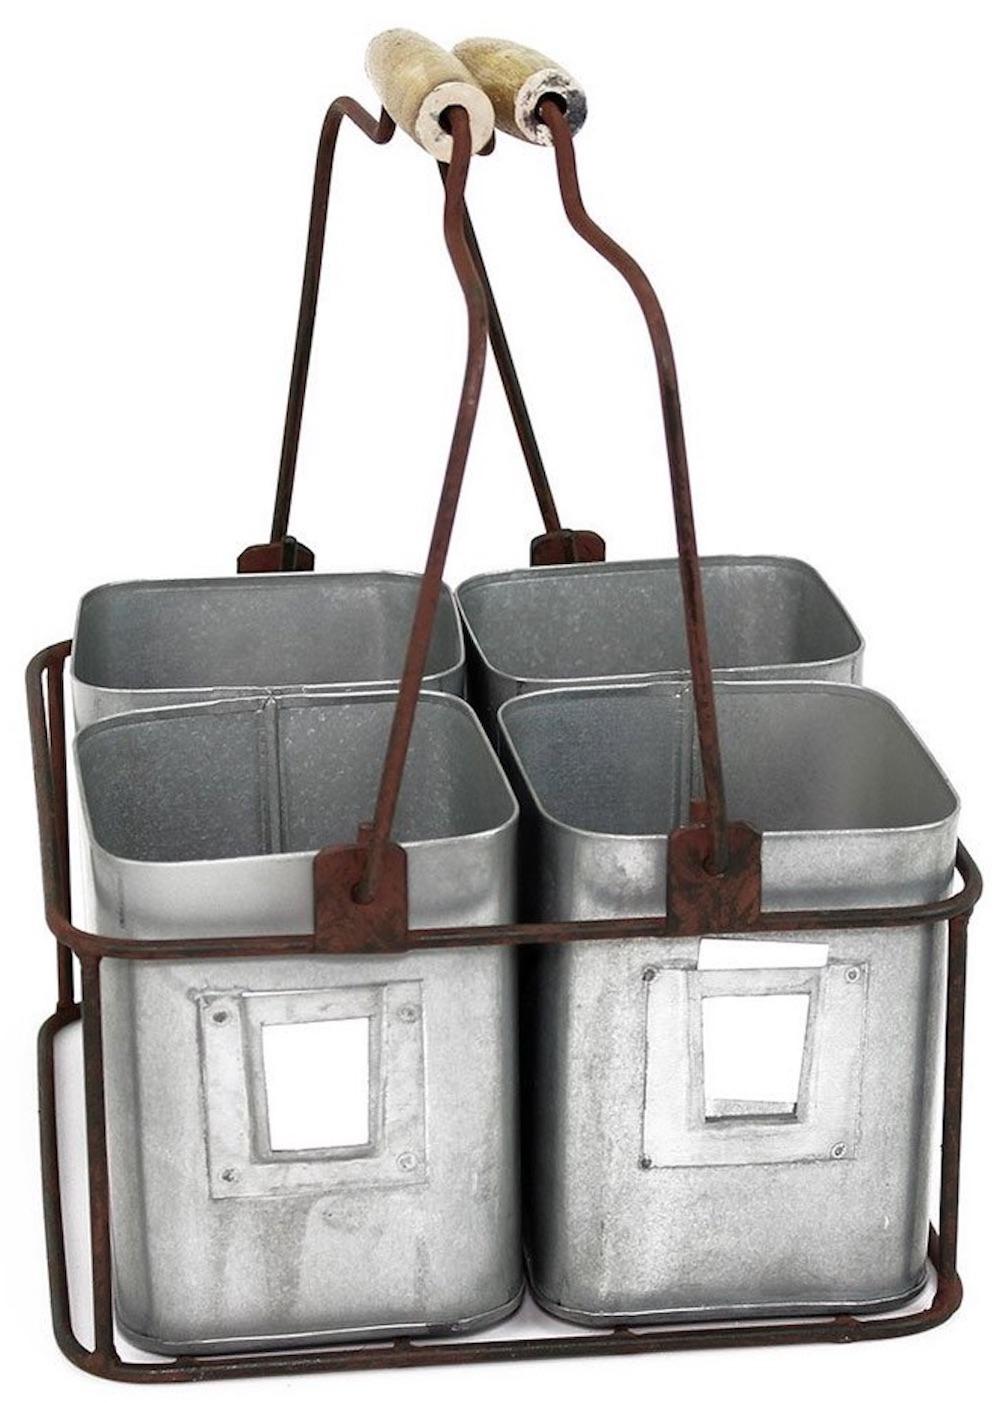 30 Farmhouse Storage Bins, Canisters, and Baskets Colonial Tin Works Metal Tin Organizer #Farmhouse #FarmhouseDecor #FarmhouseStorage #RusticStorage #CountryLiving #IndustrialStorage #Organization #Storage